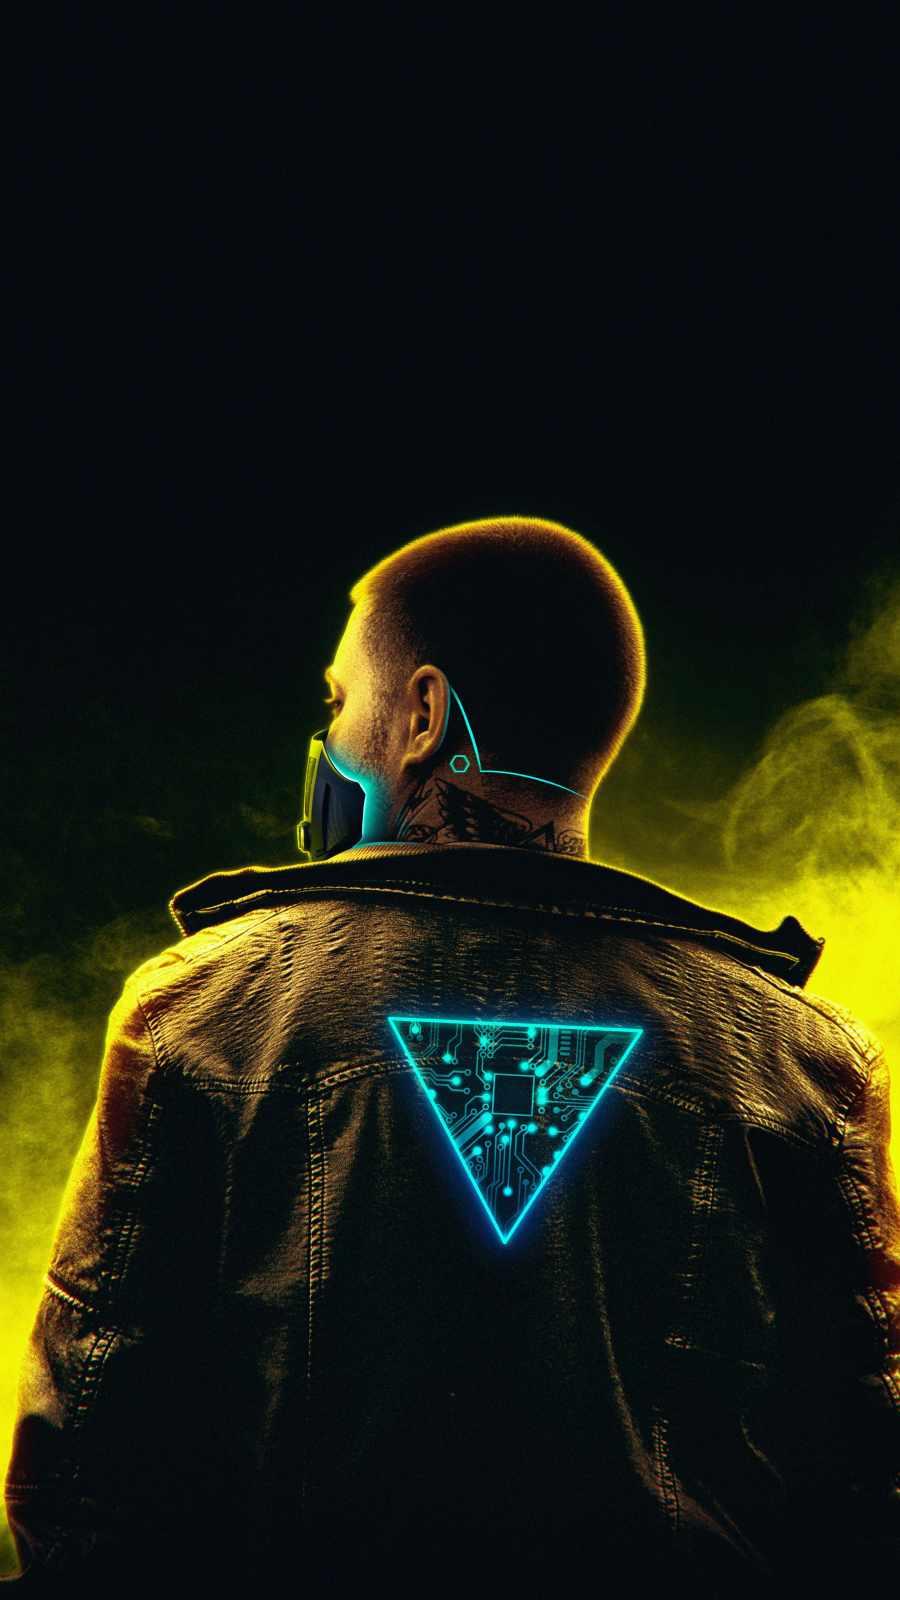 Cyborg Guy iPhone Wallpaper